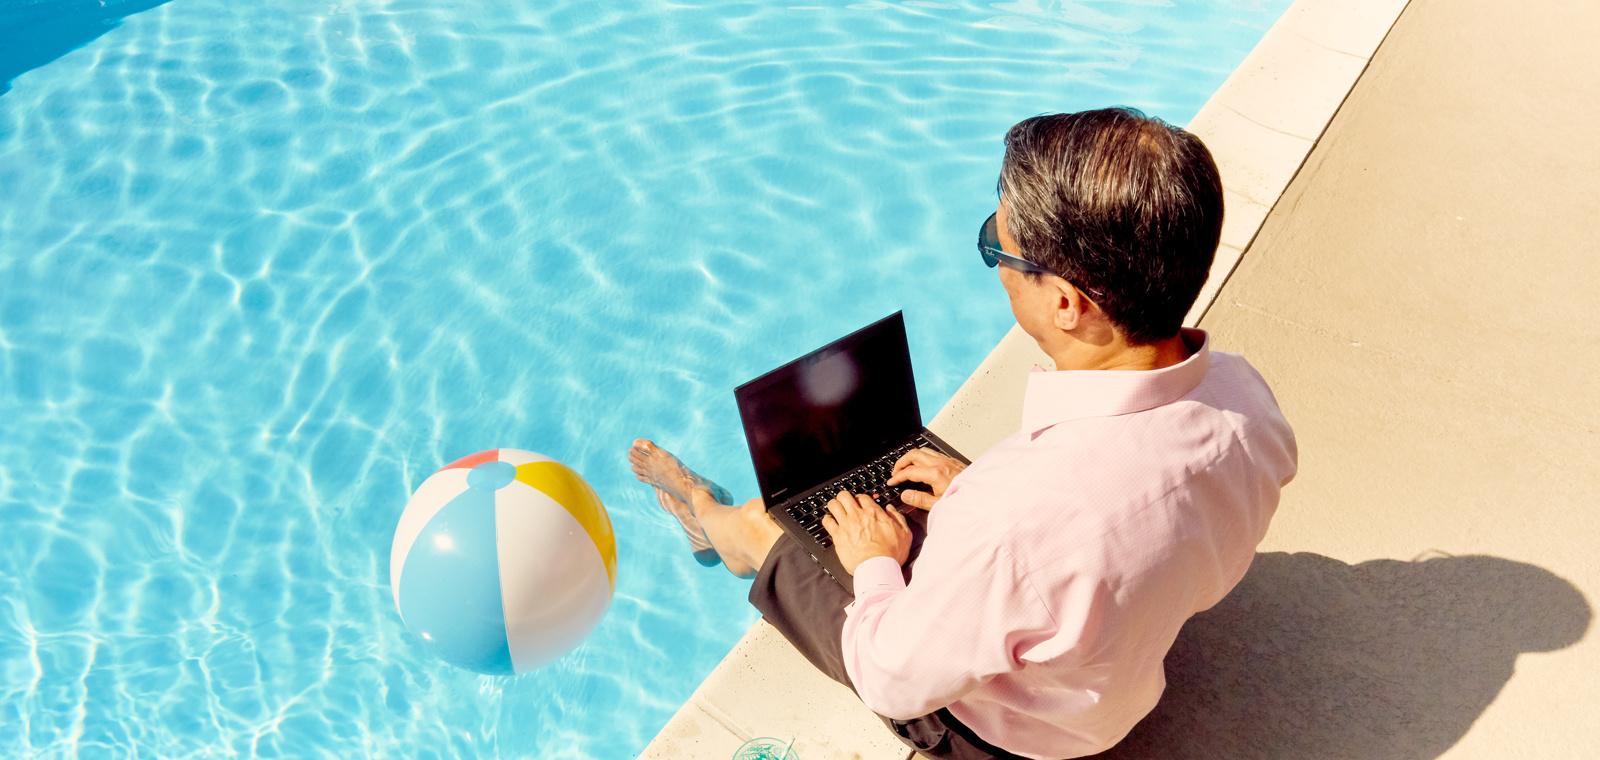 Man working on Laptop Poolside